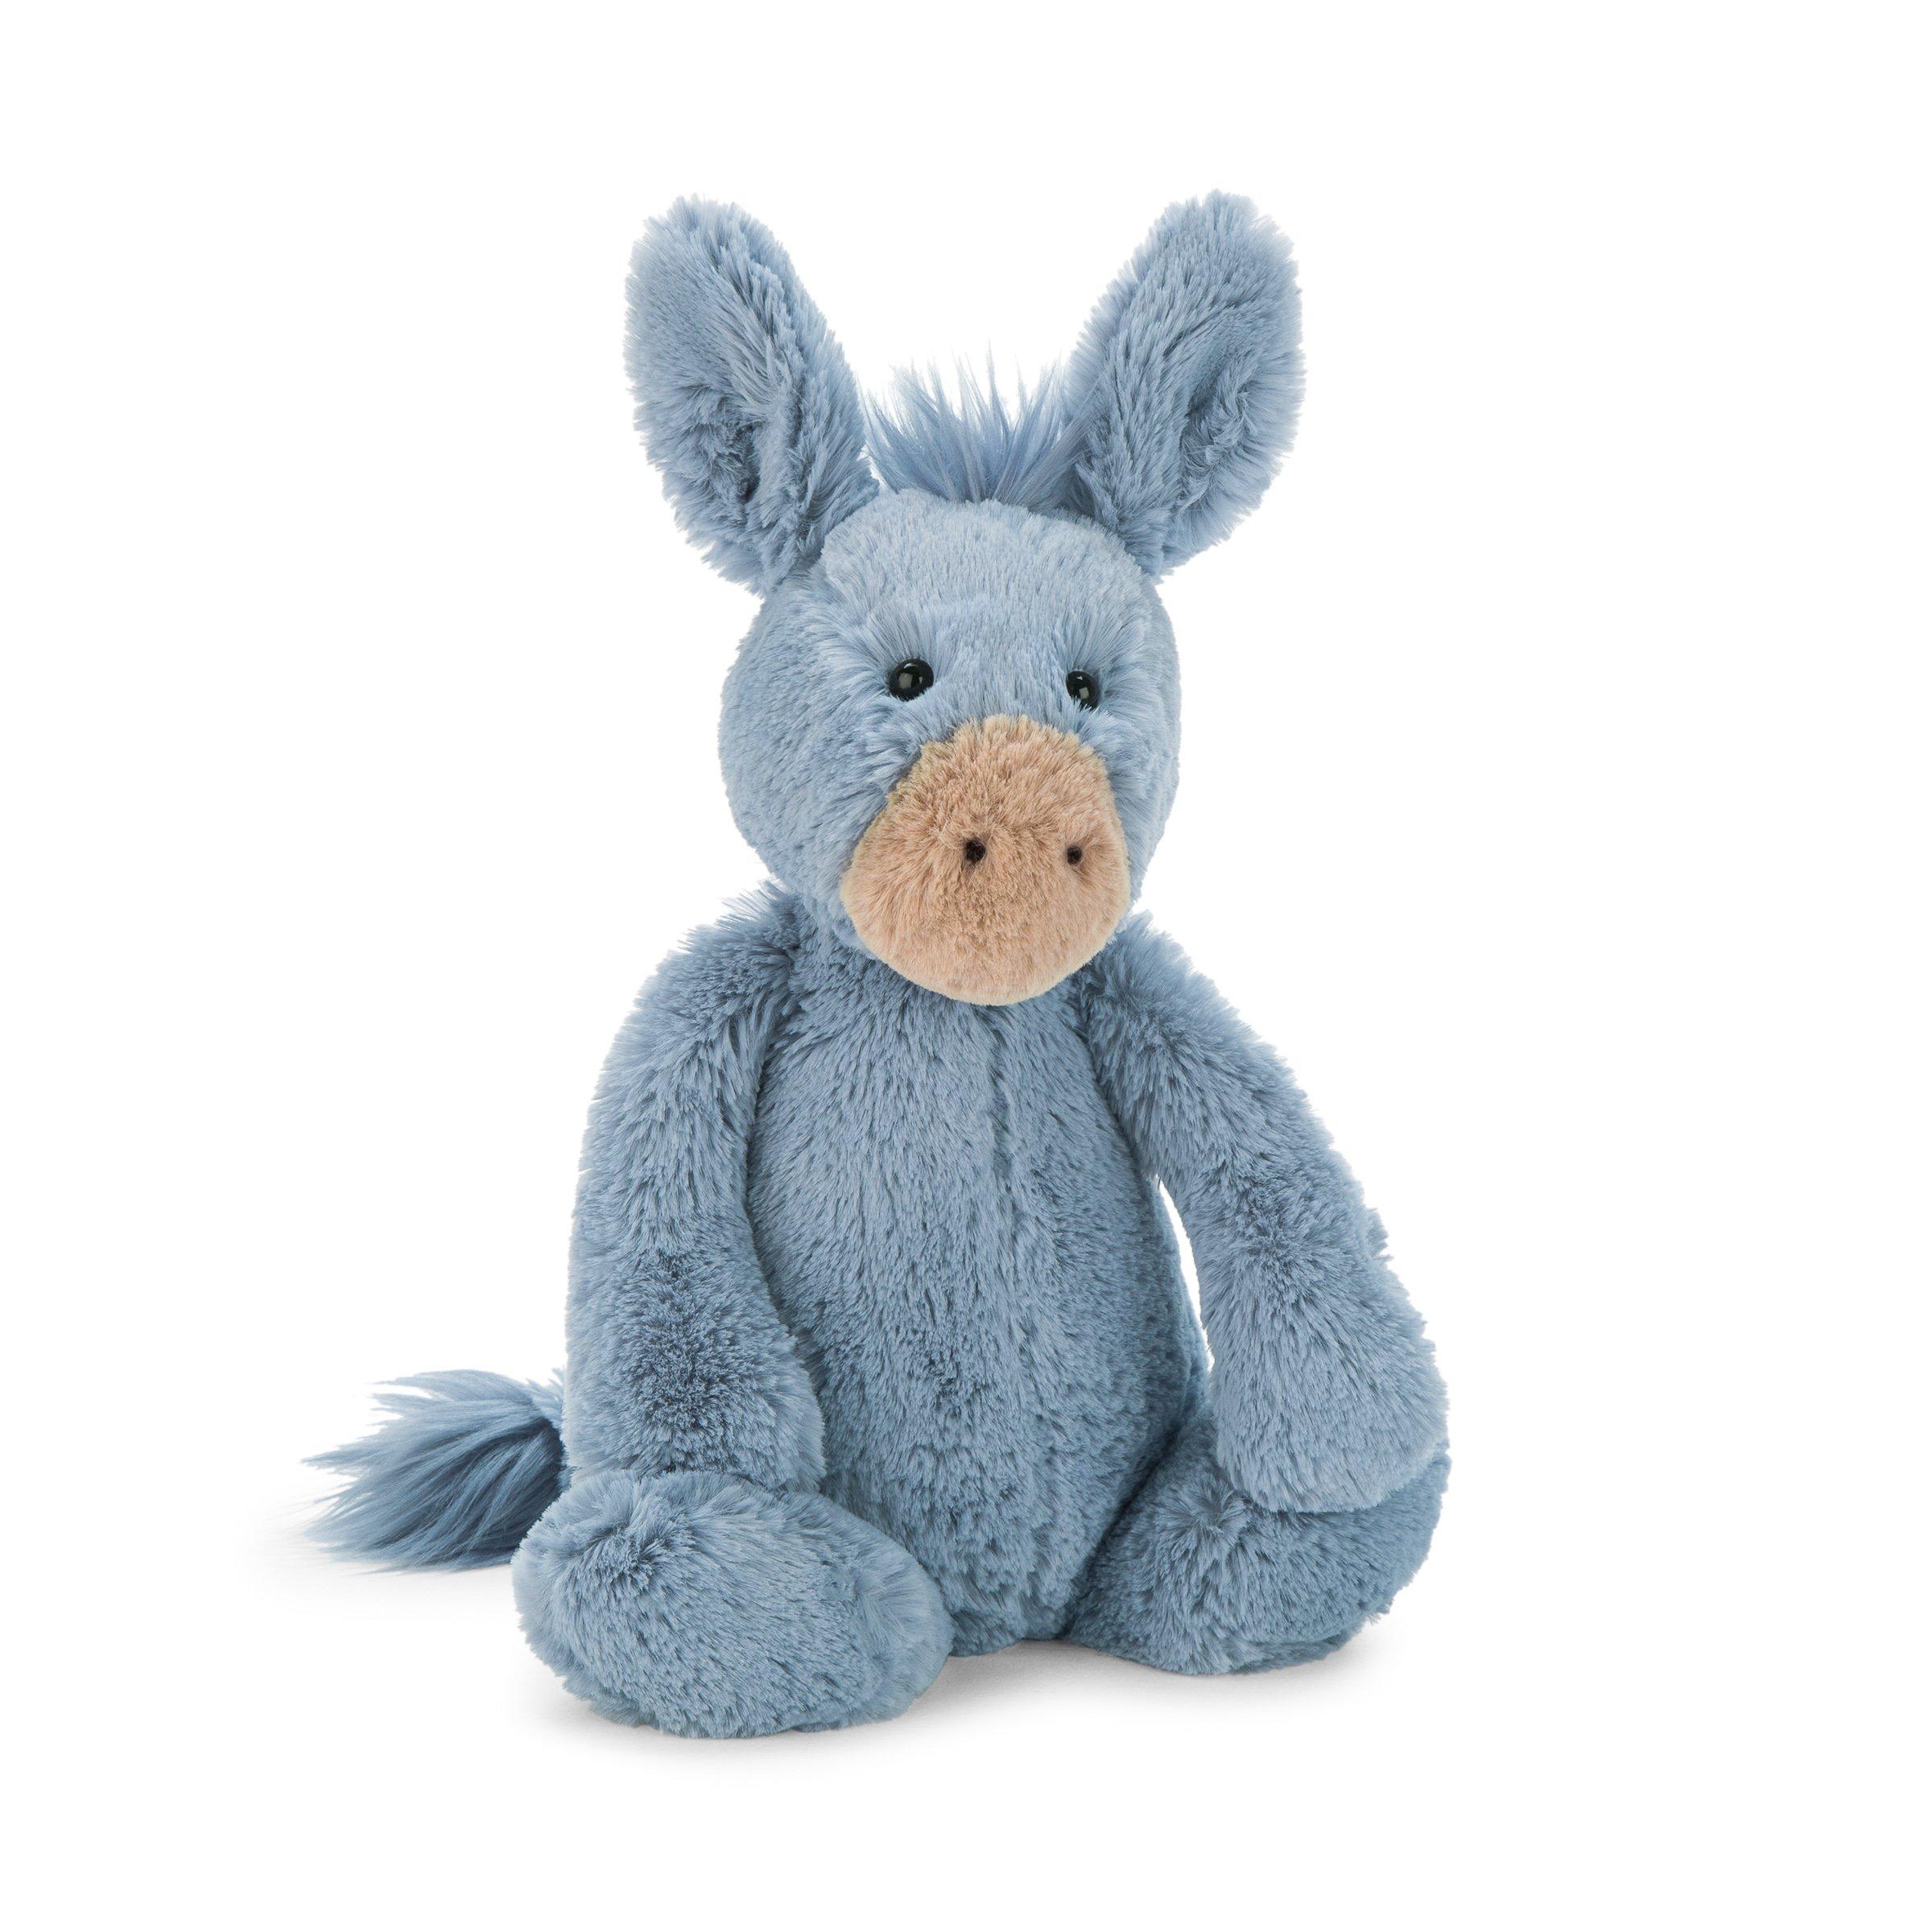 Jellycat Bashful Donkey Stuffed Animal, Medium, 12 inches